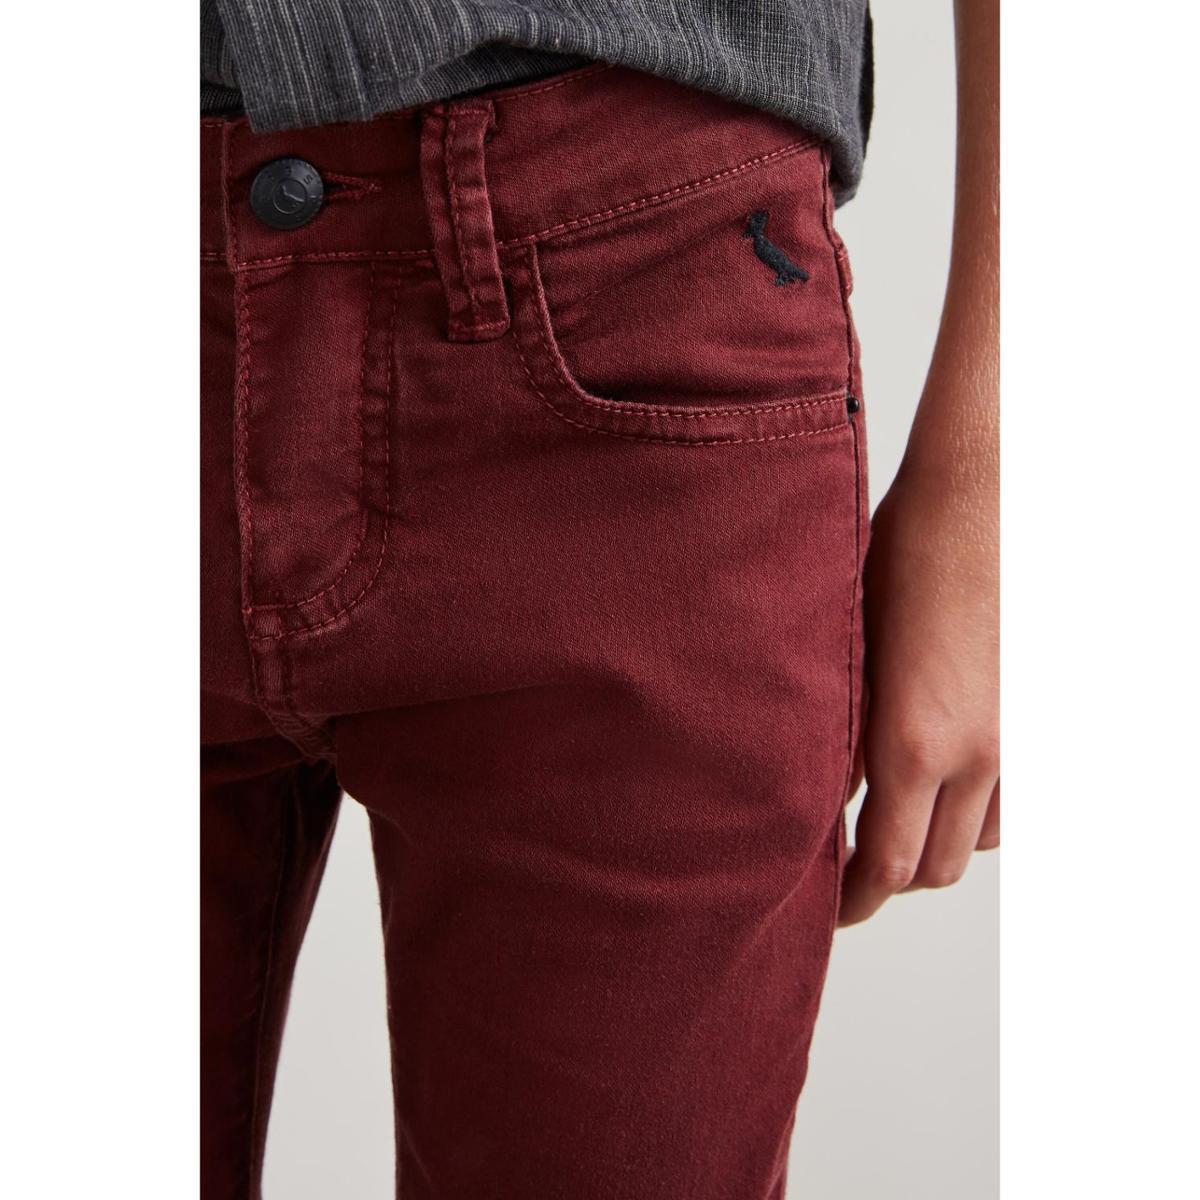 Calça Mini PF Skinny Color Ver19 Reserva Infantil Masculino - Bordô